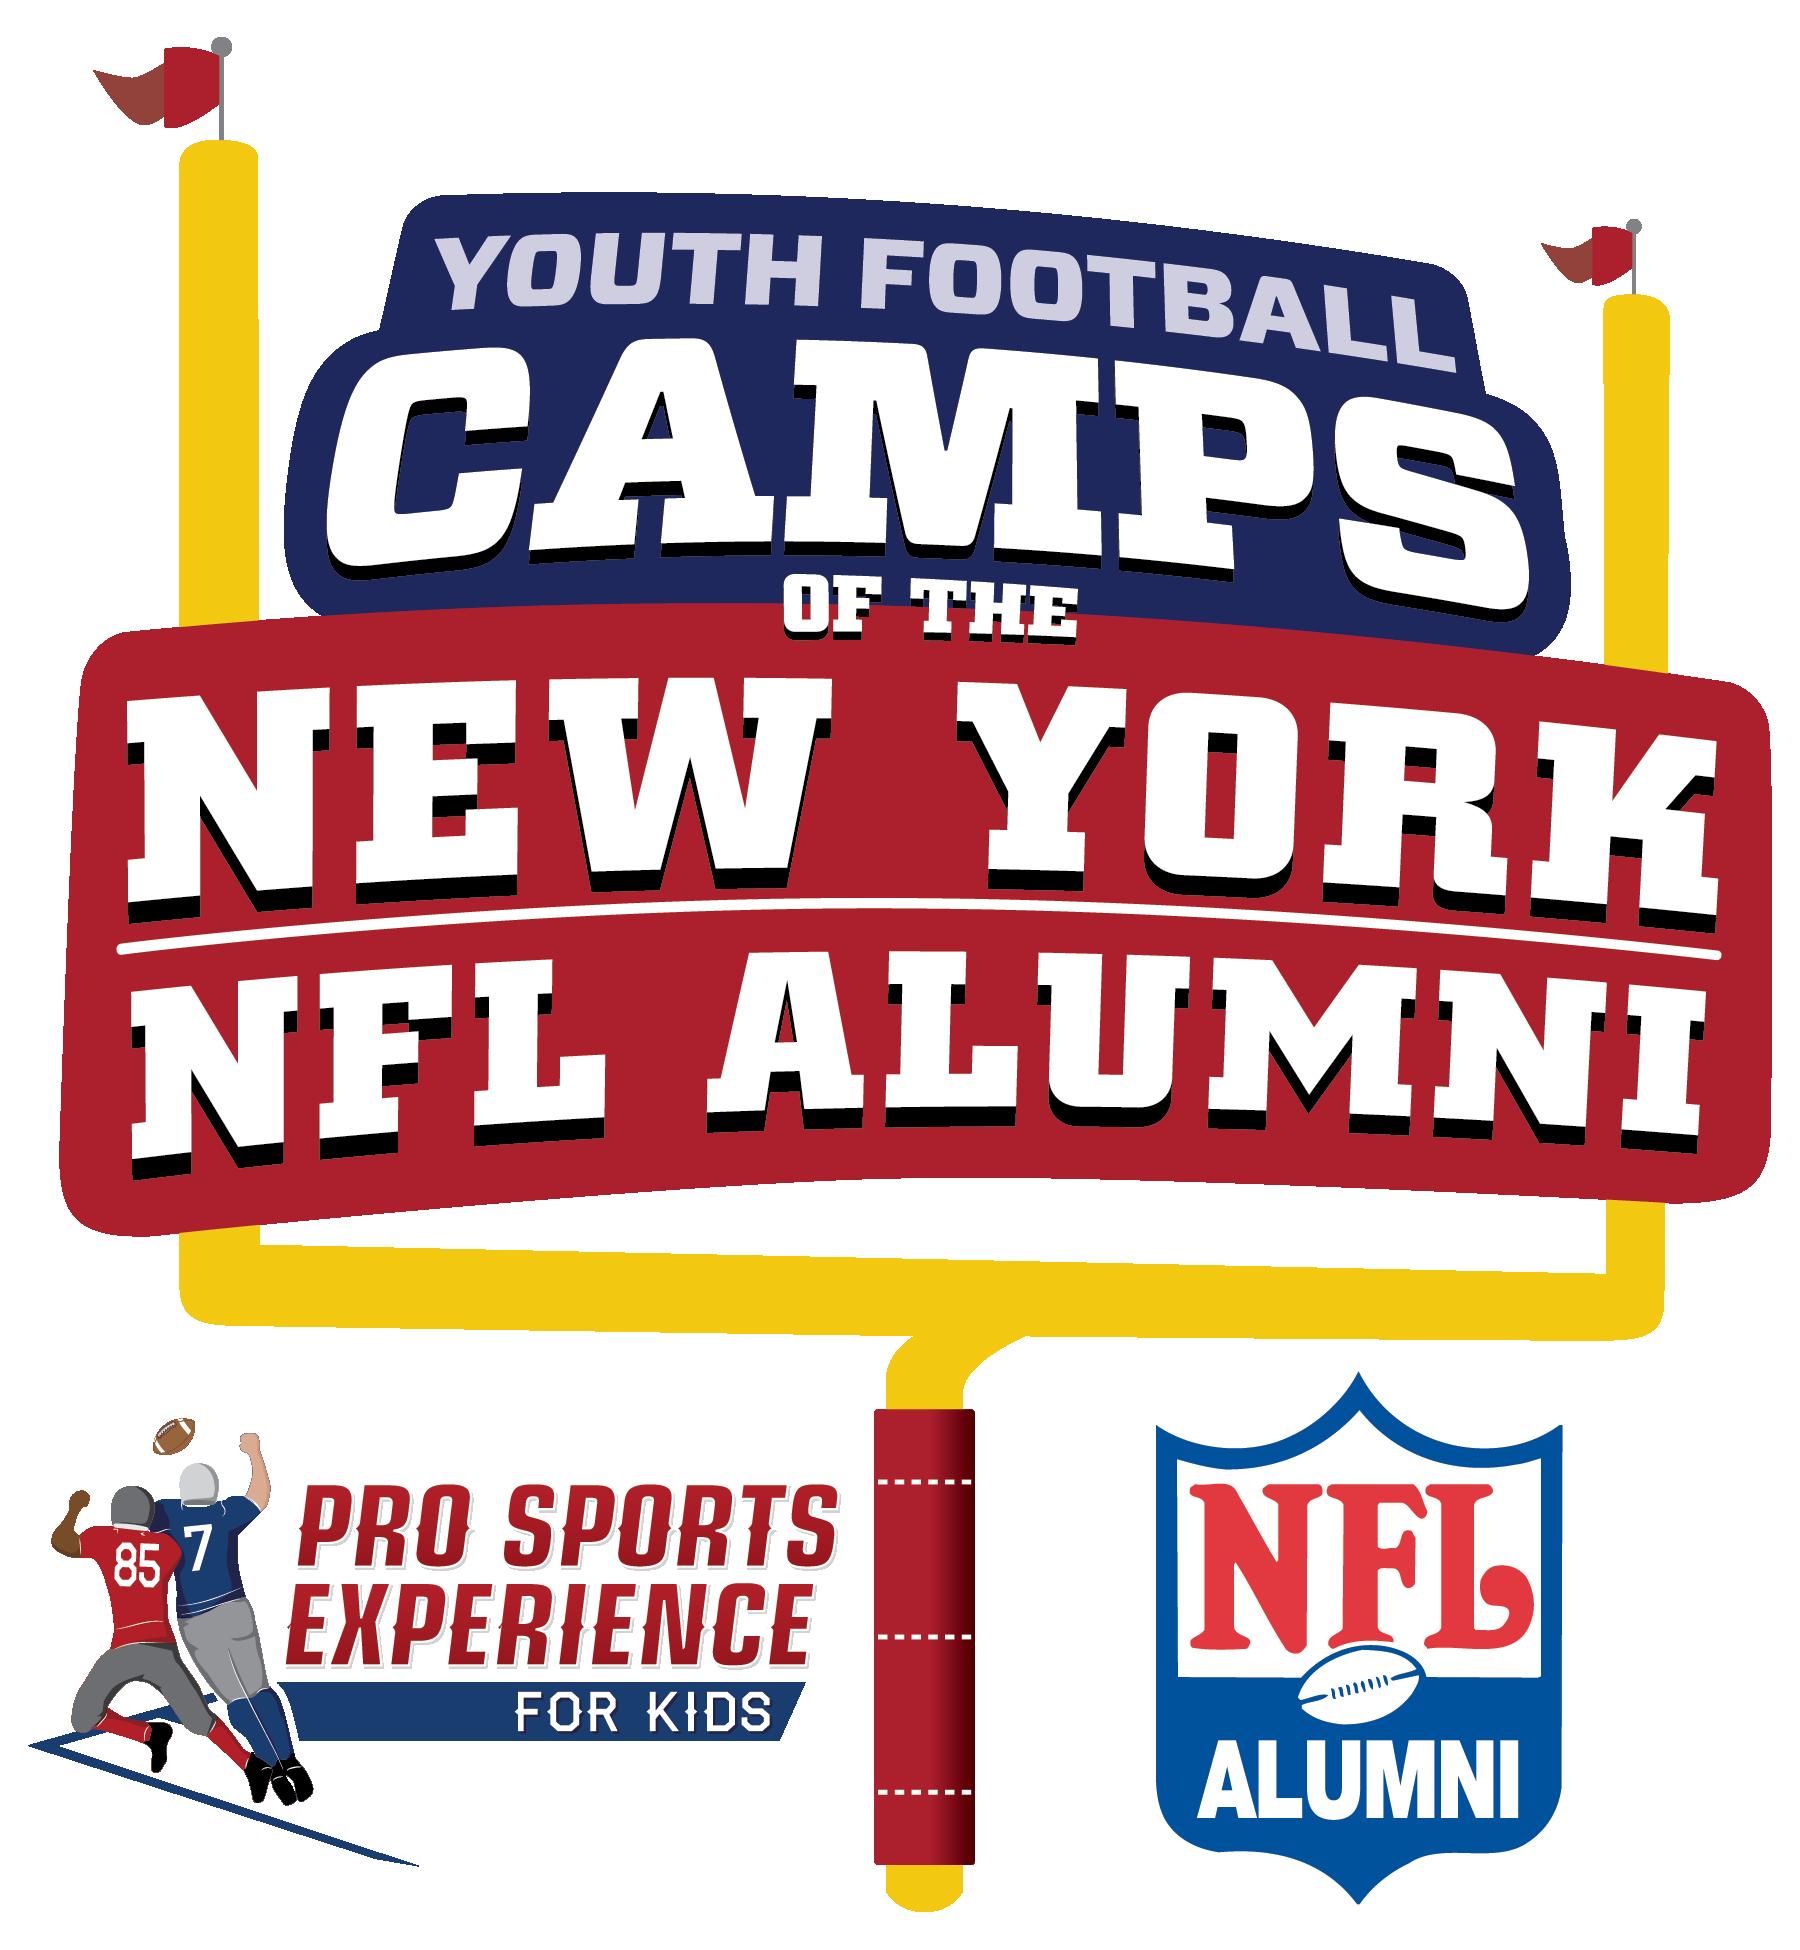 New York NFL Alumni Hero Youth Football Camps - Pine Bush